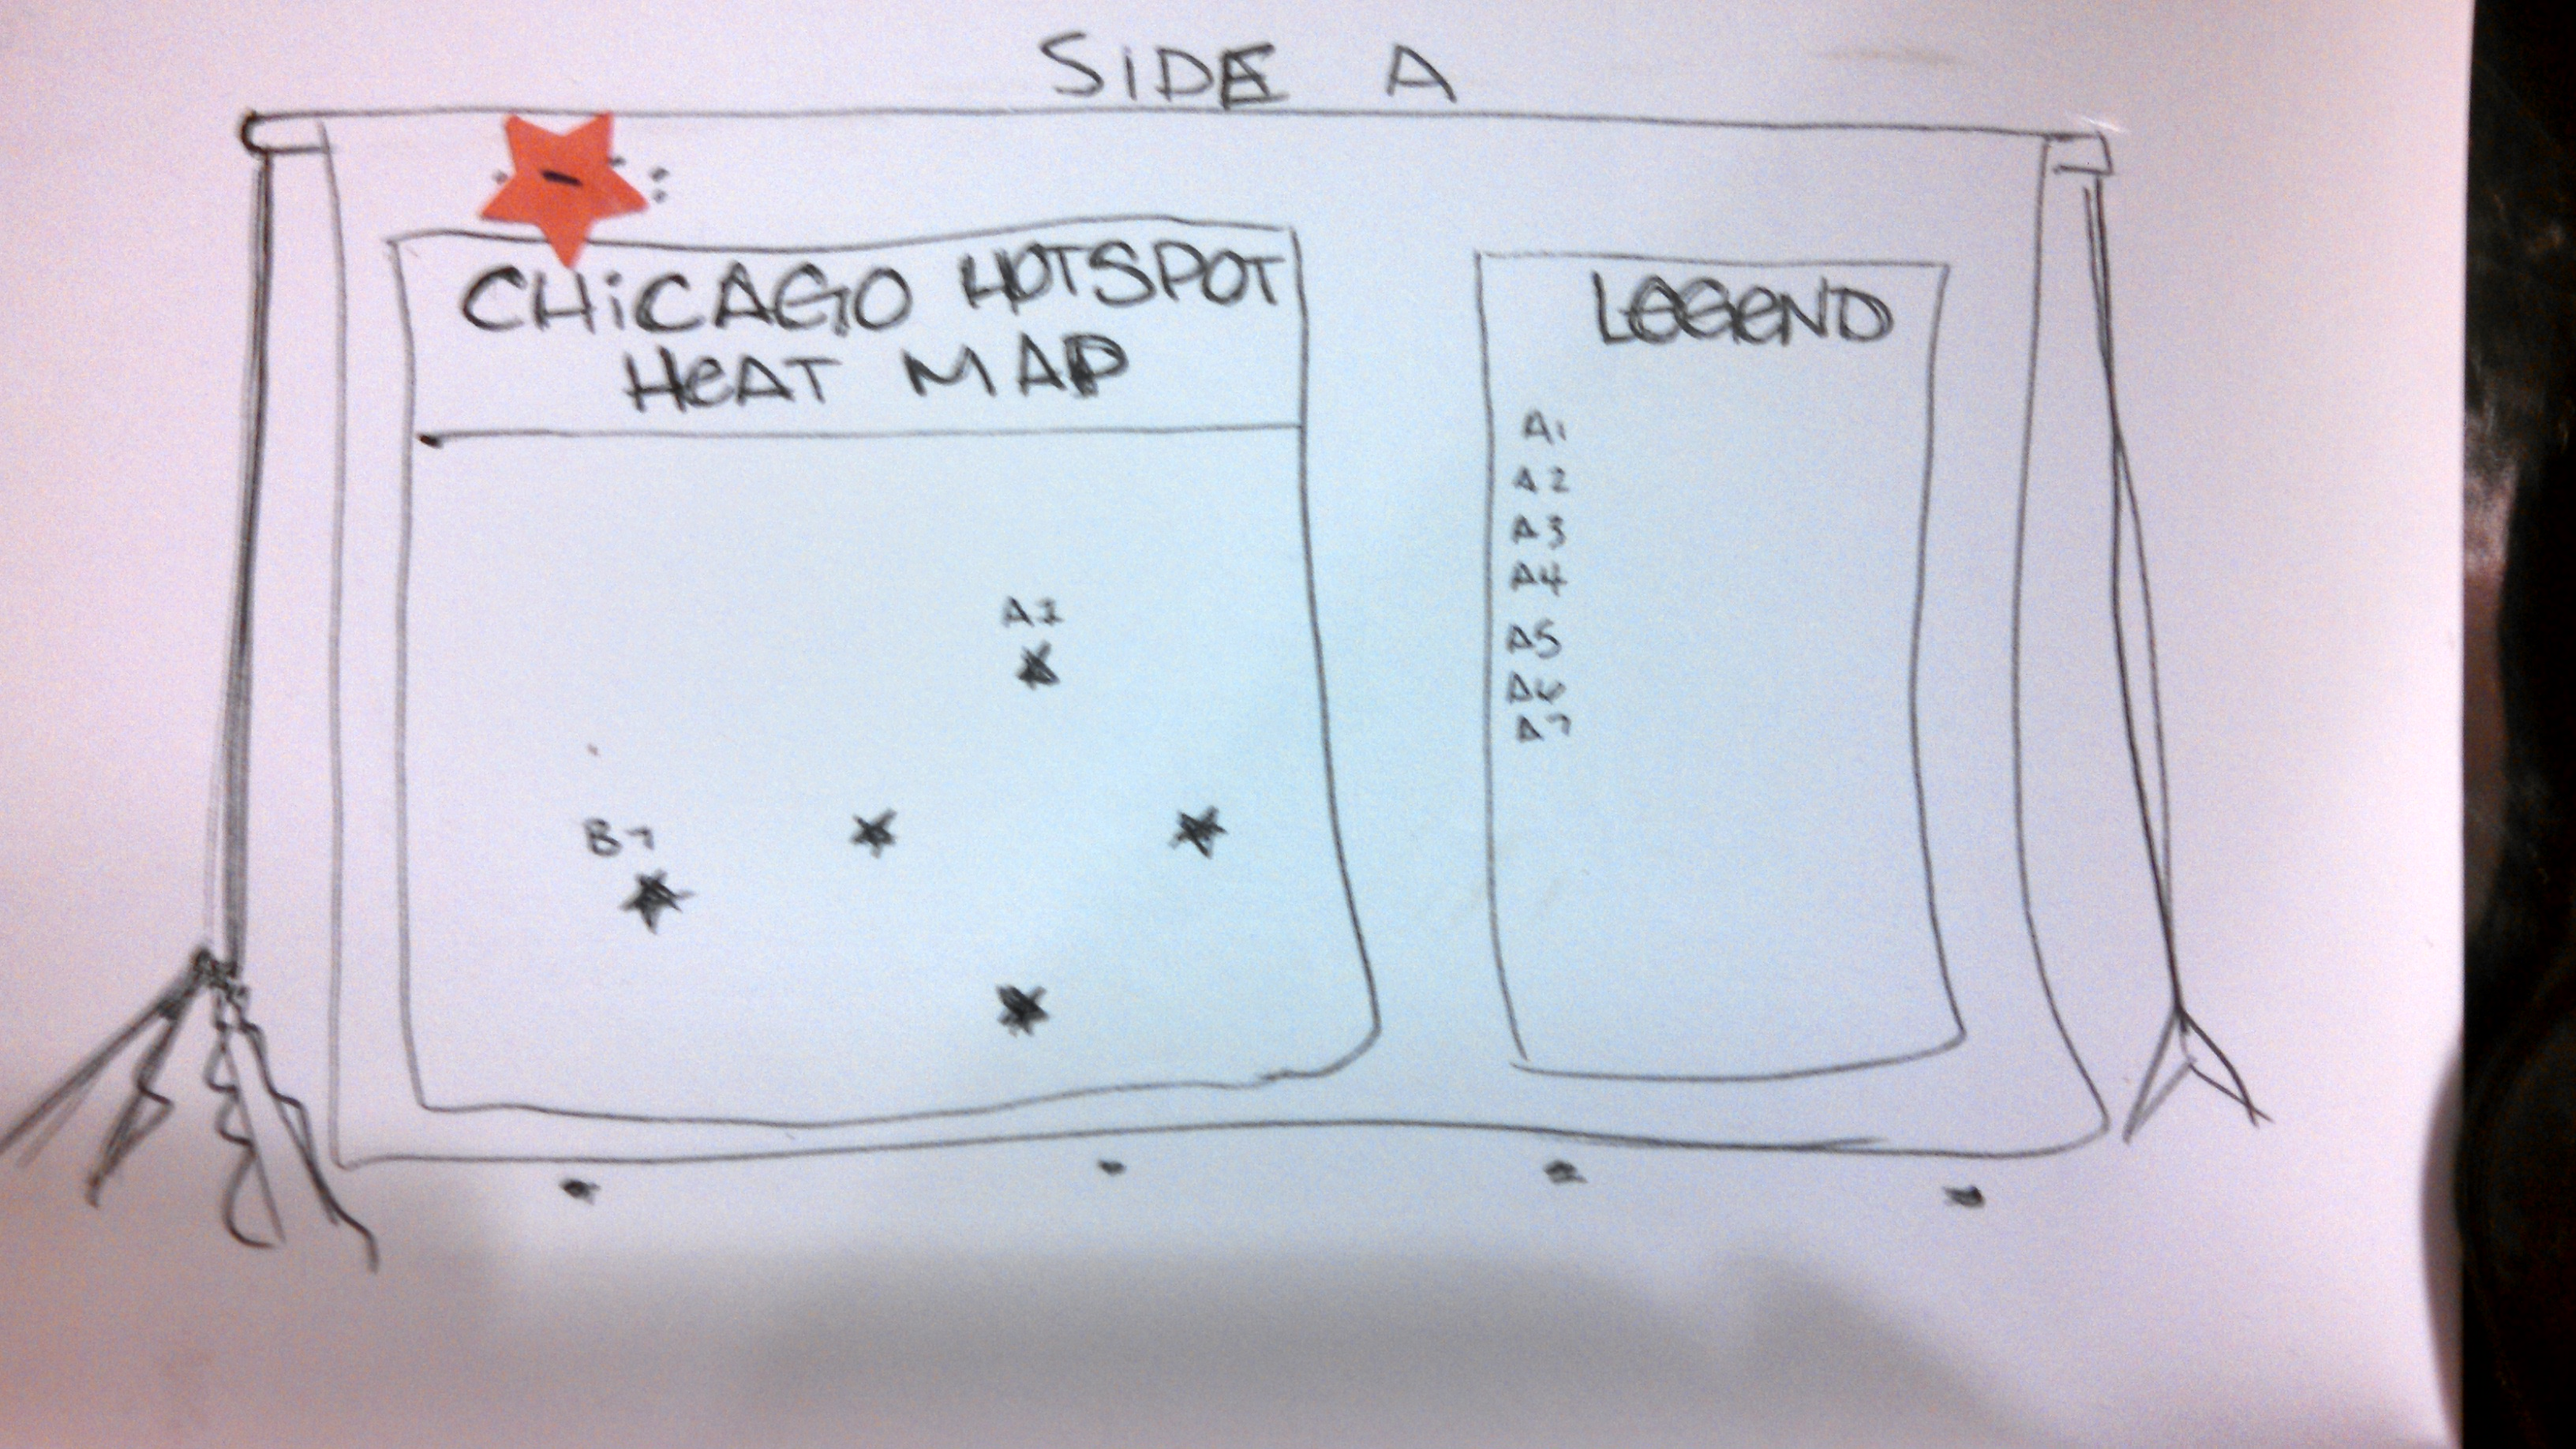 Chicago Hot Spot Heat Map – : ) ( : on